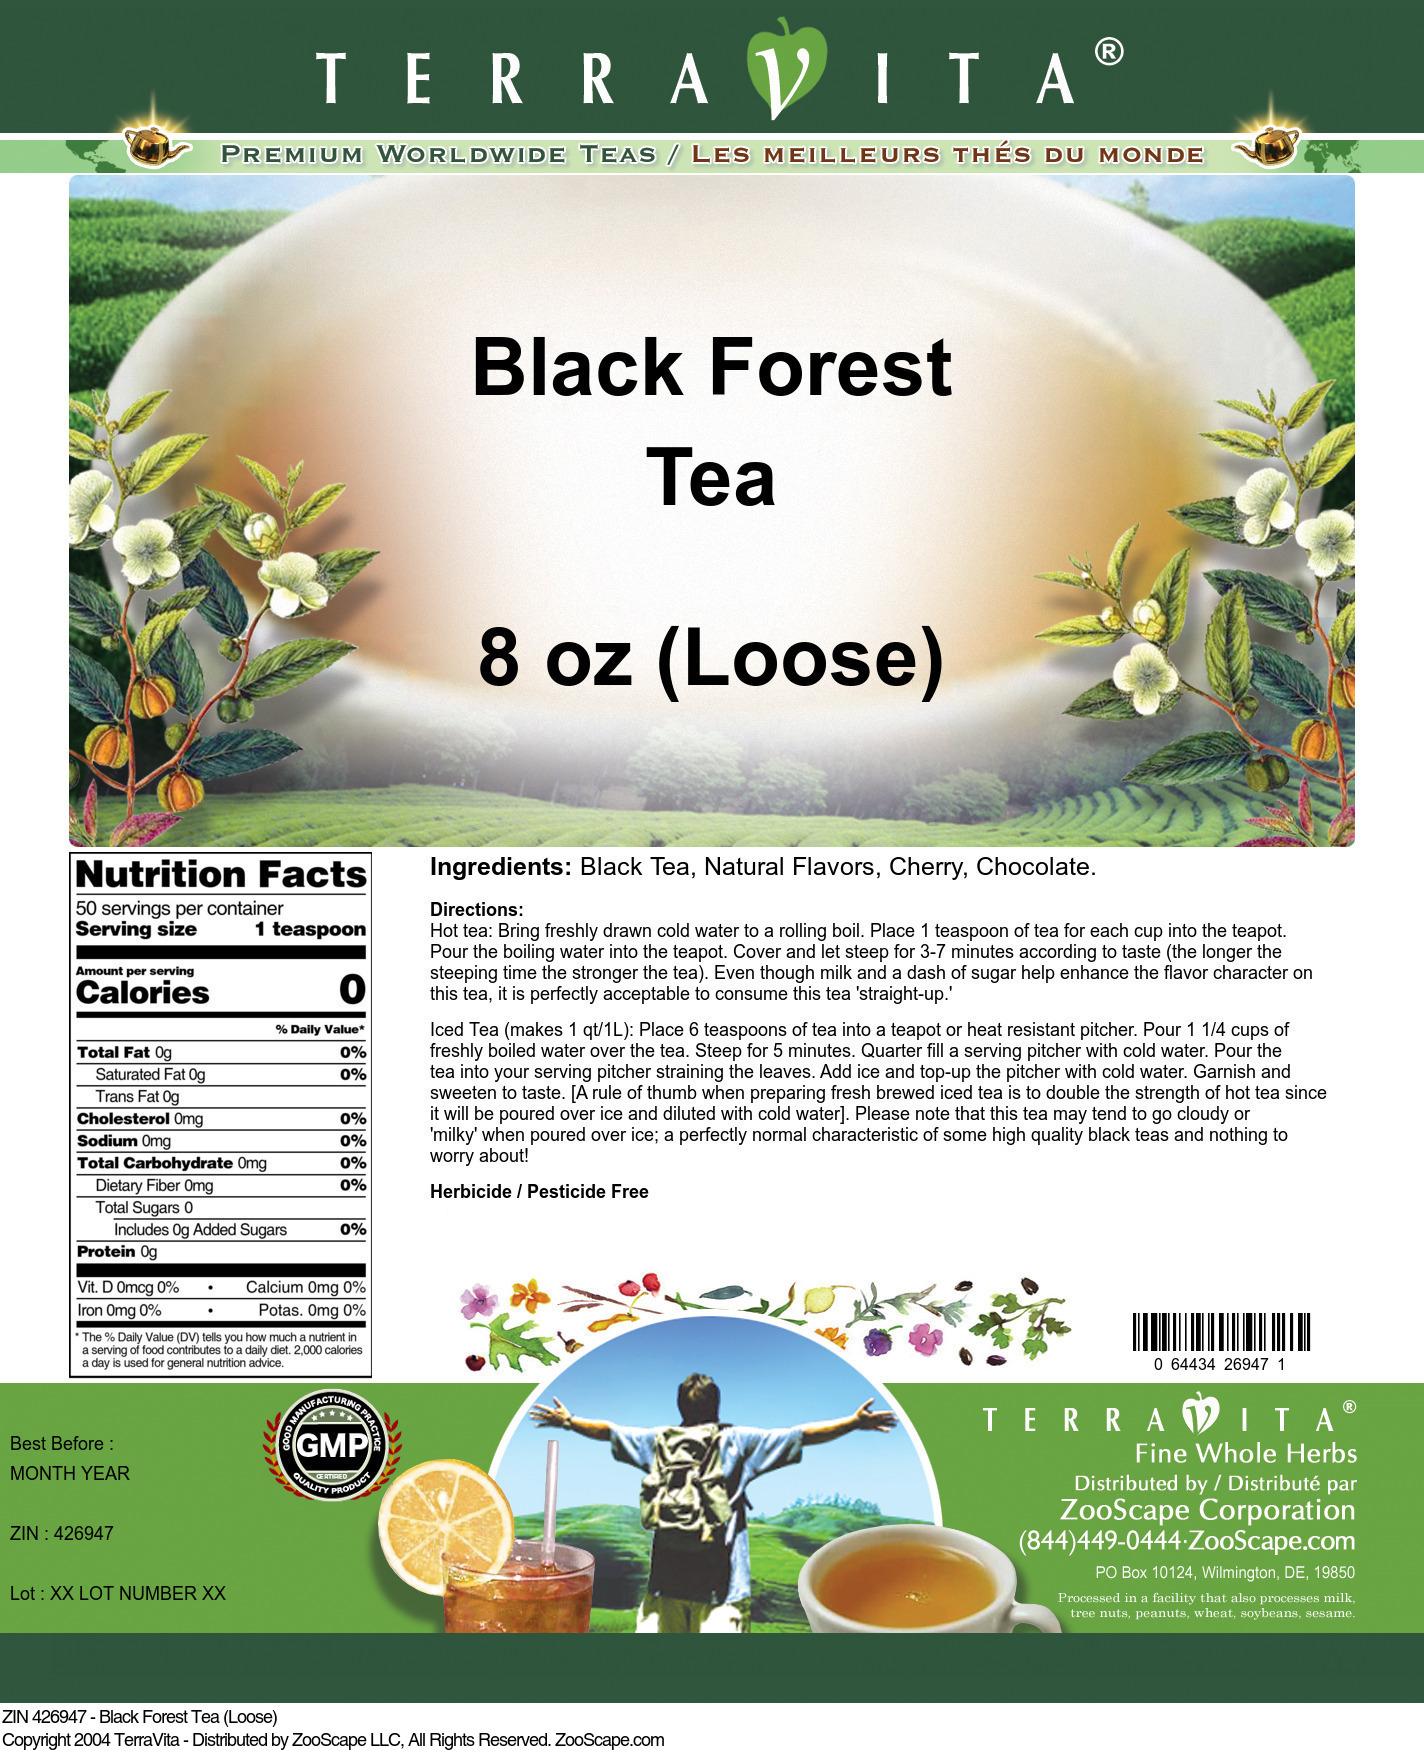 Black Forest Tea (Loose)